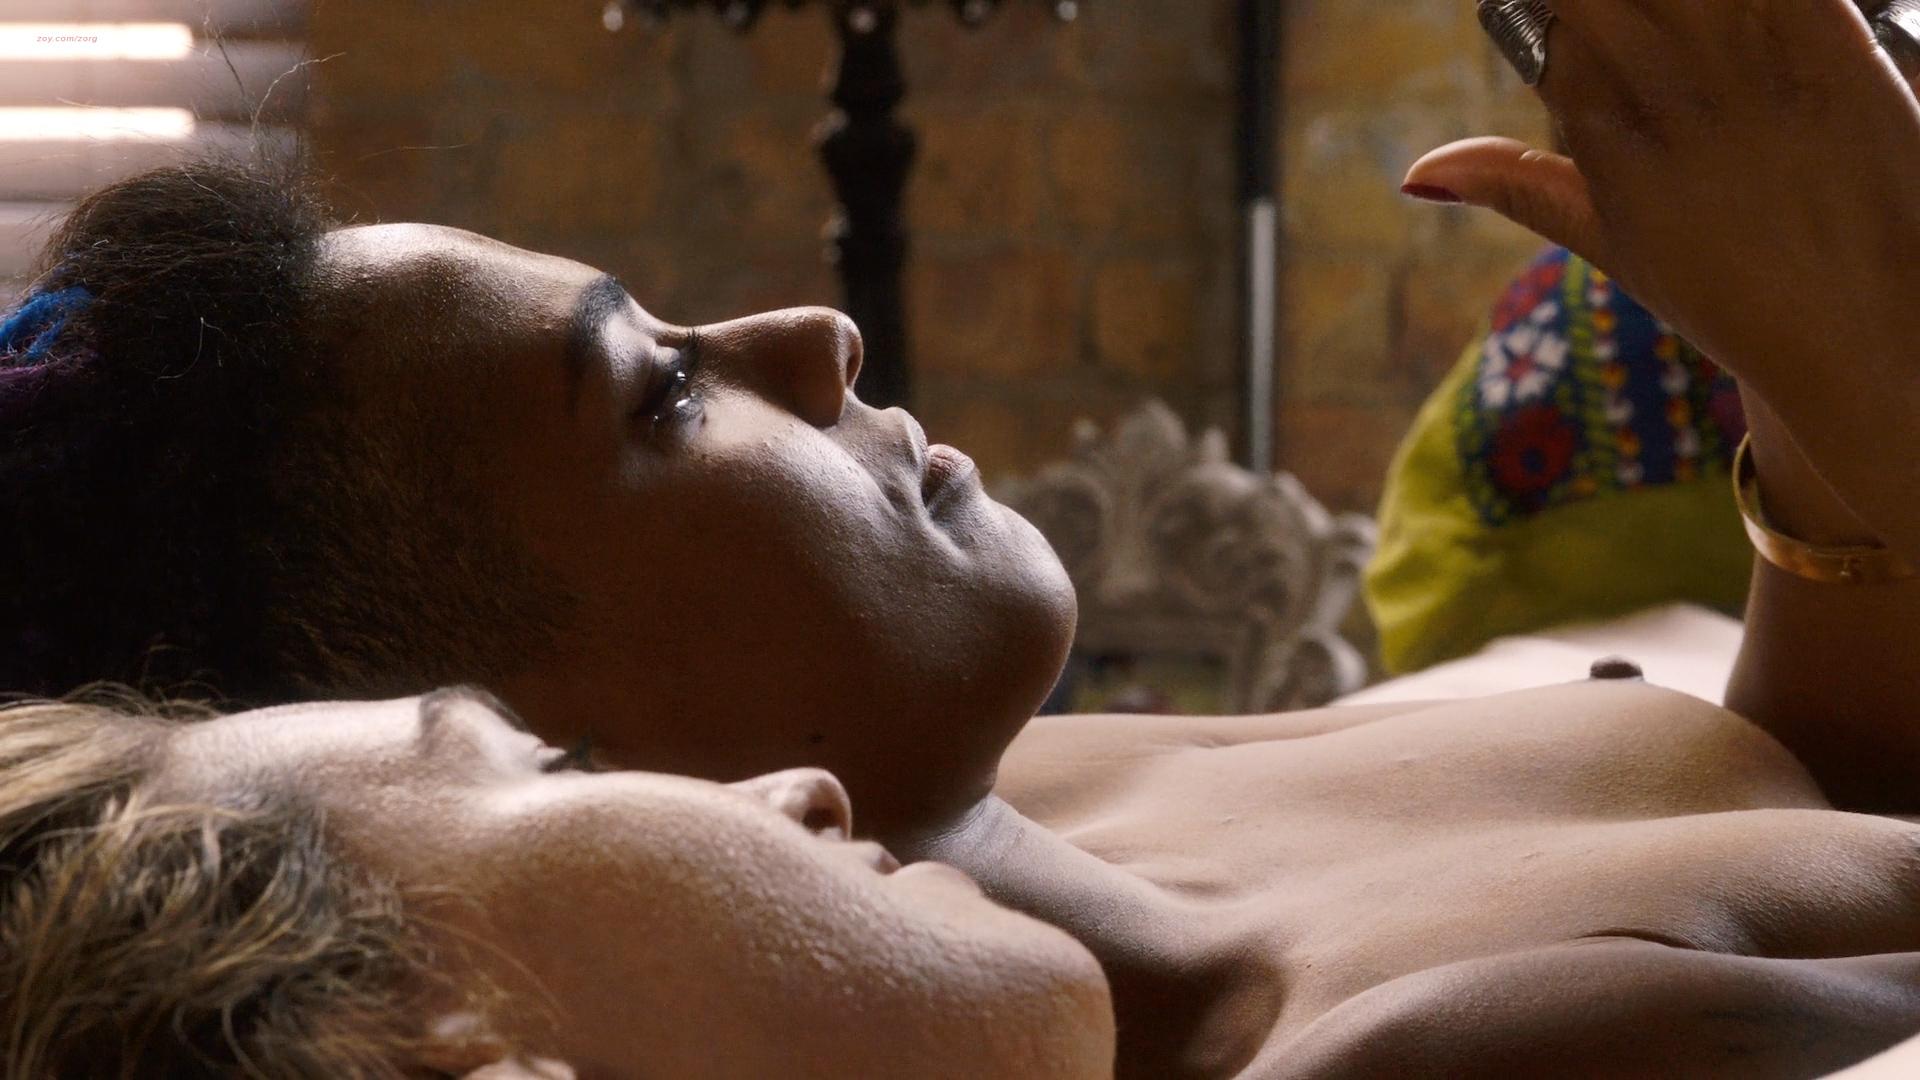 Anja Ali Samantha Lesbian Porn jamie clayton nude topless and lesbian sex with freema